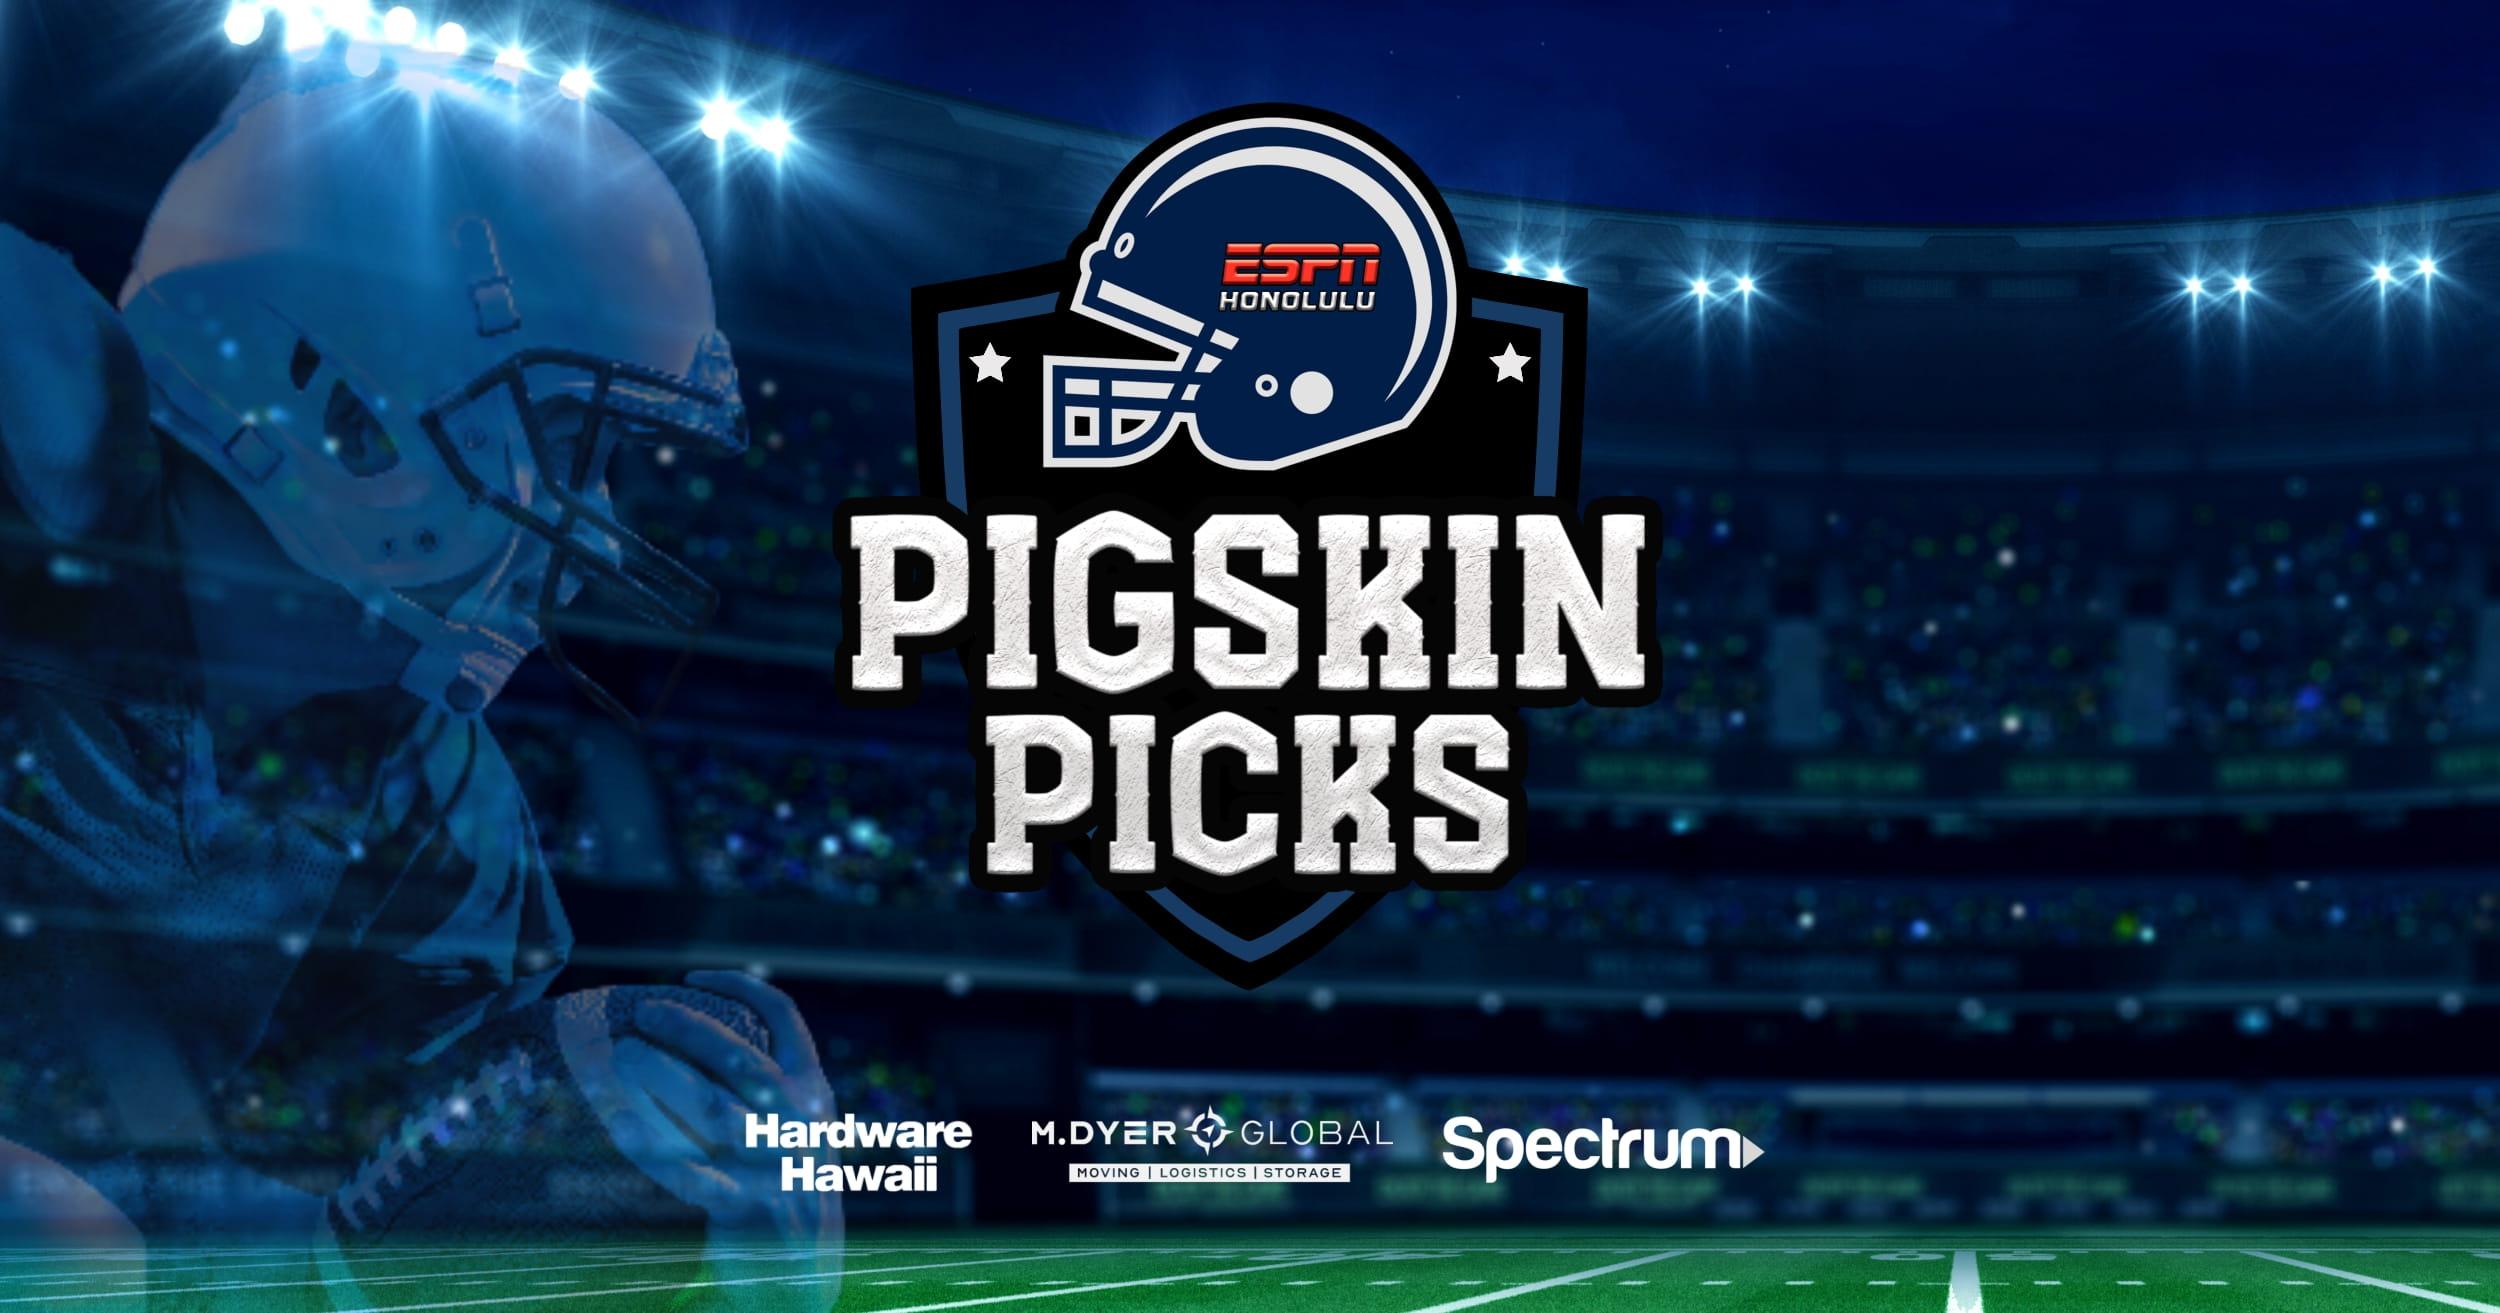 ESPN Honolulu's Pigskin Picks